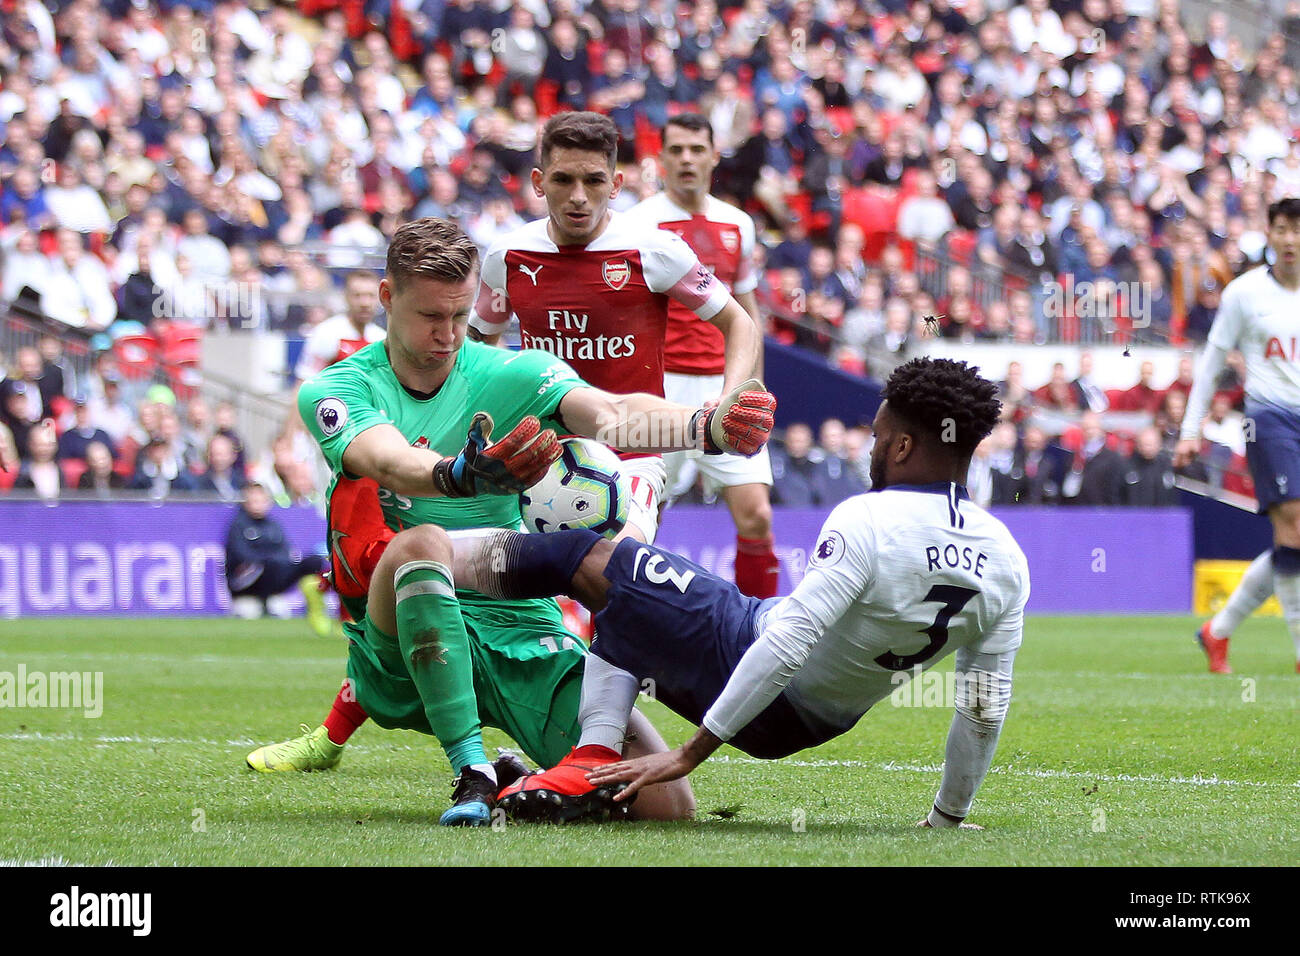 Danny Rose Of Tottenham Hotspur R Fouls Bernd Leno The Goalkeeper Of Arsenal L Epl Premier